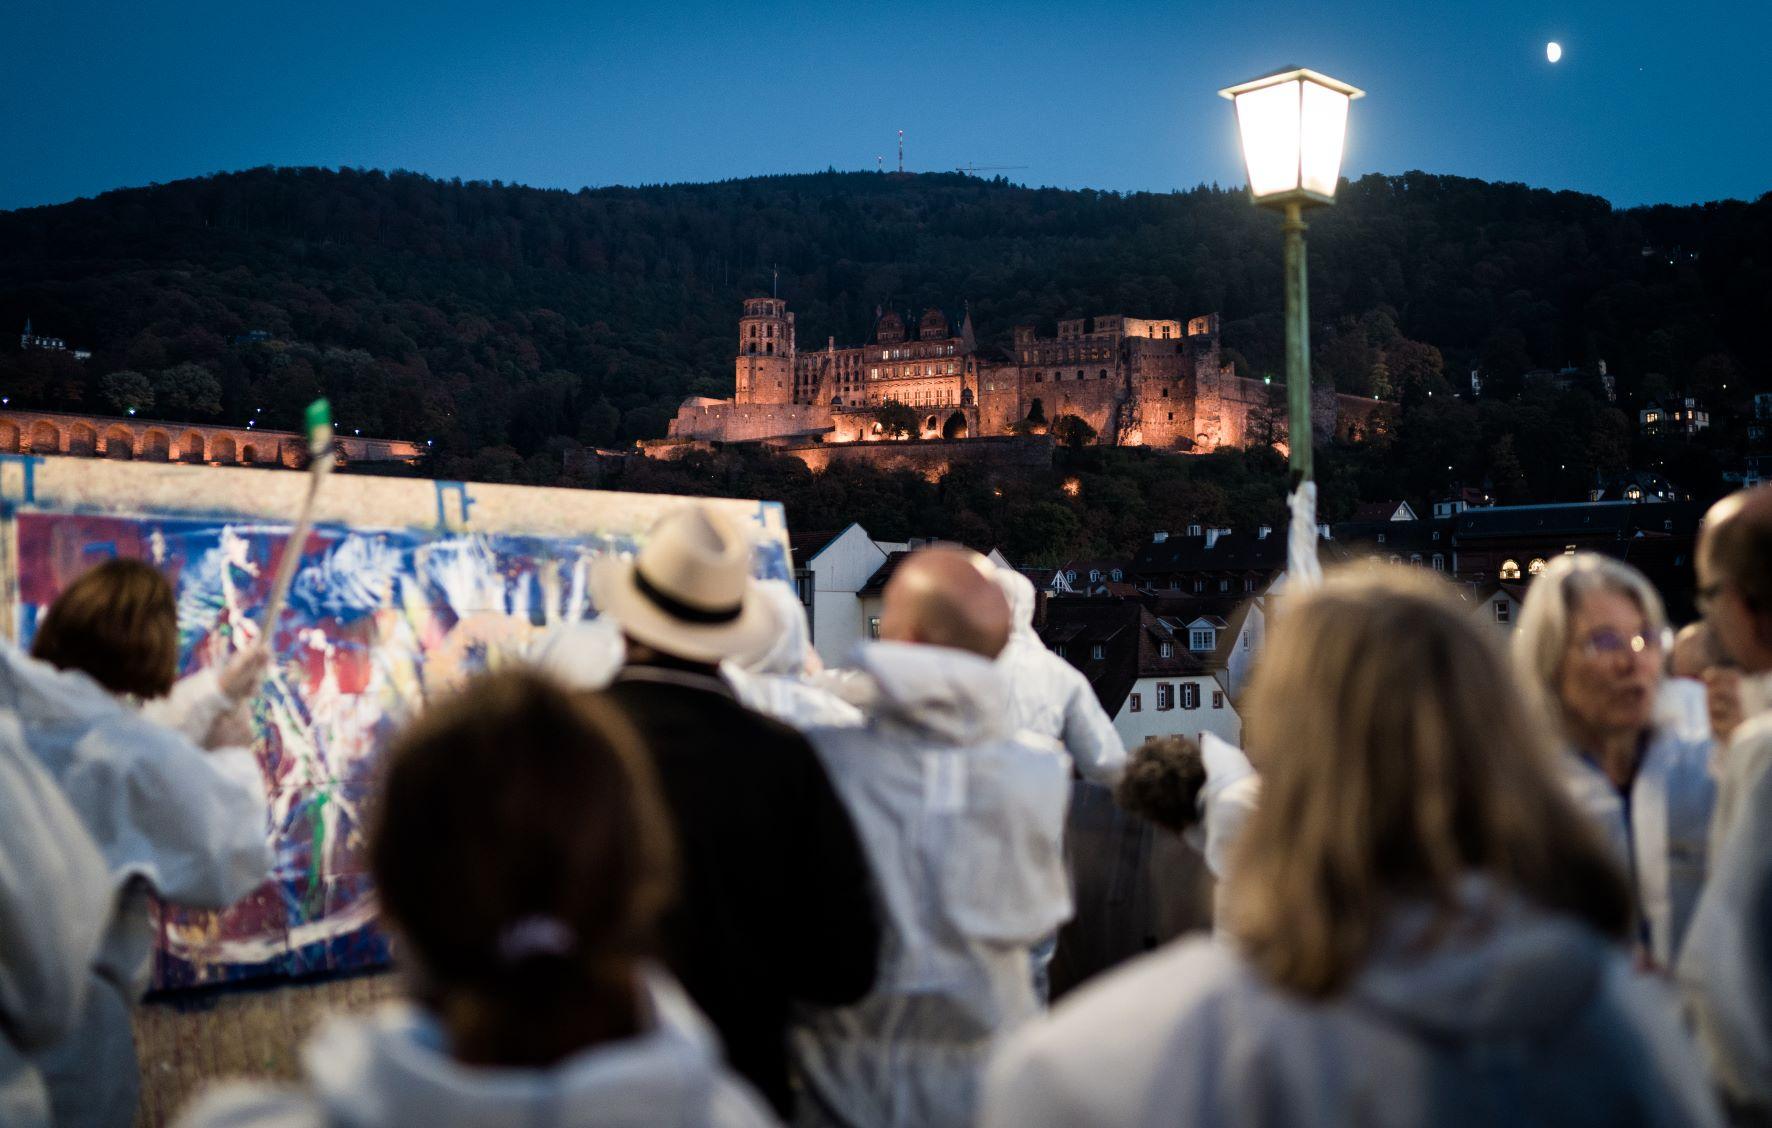 2018-10-SERVANT-LEADERSHIP-Kongress-Fotografie_TINBIRD-FILM-BUREAU-Joana-Kauer-3159.jpg